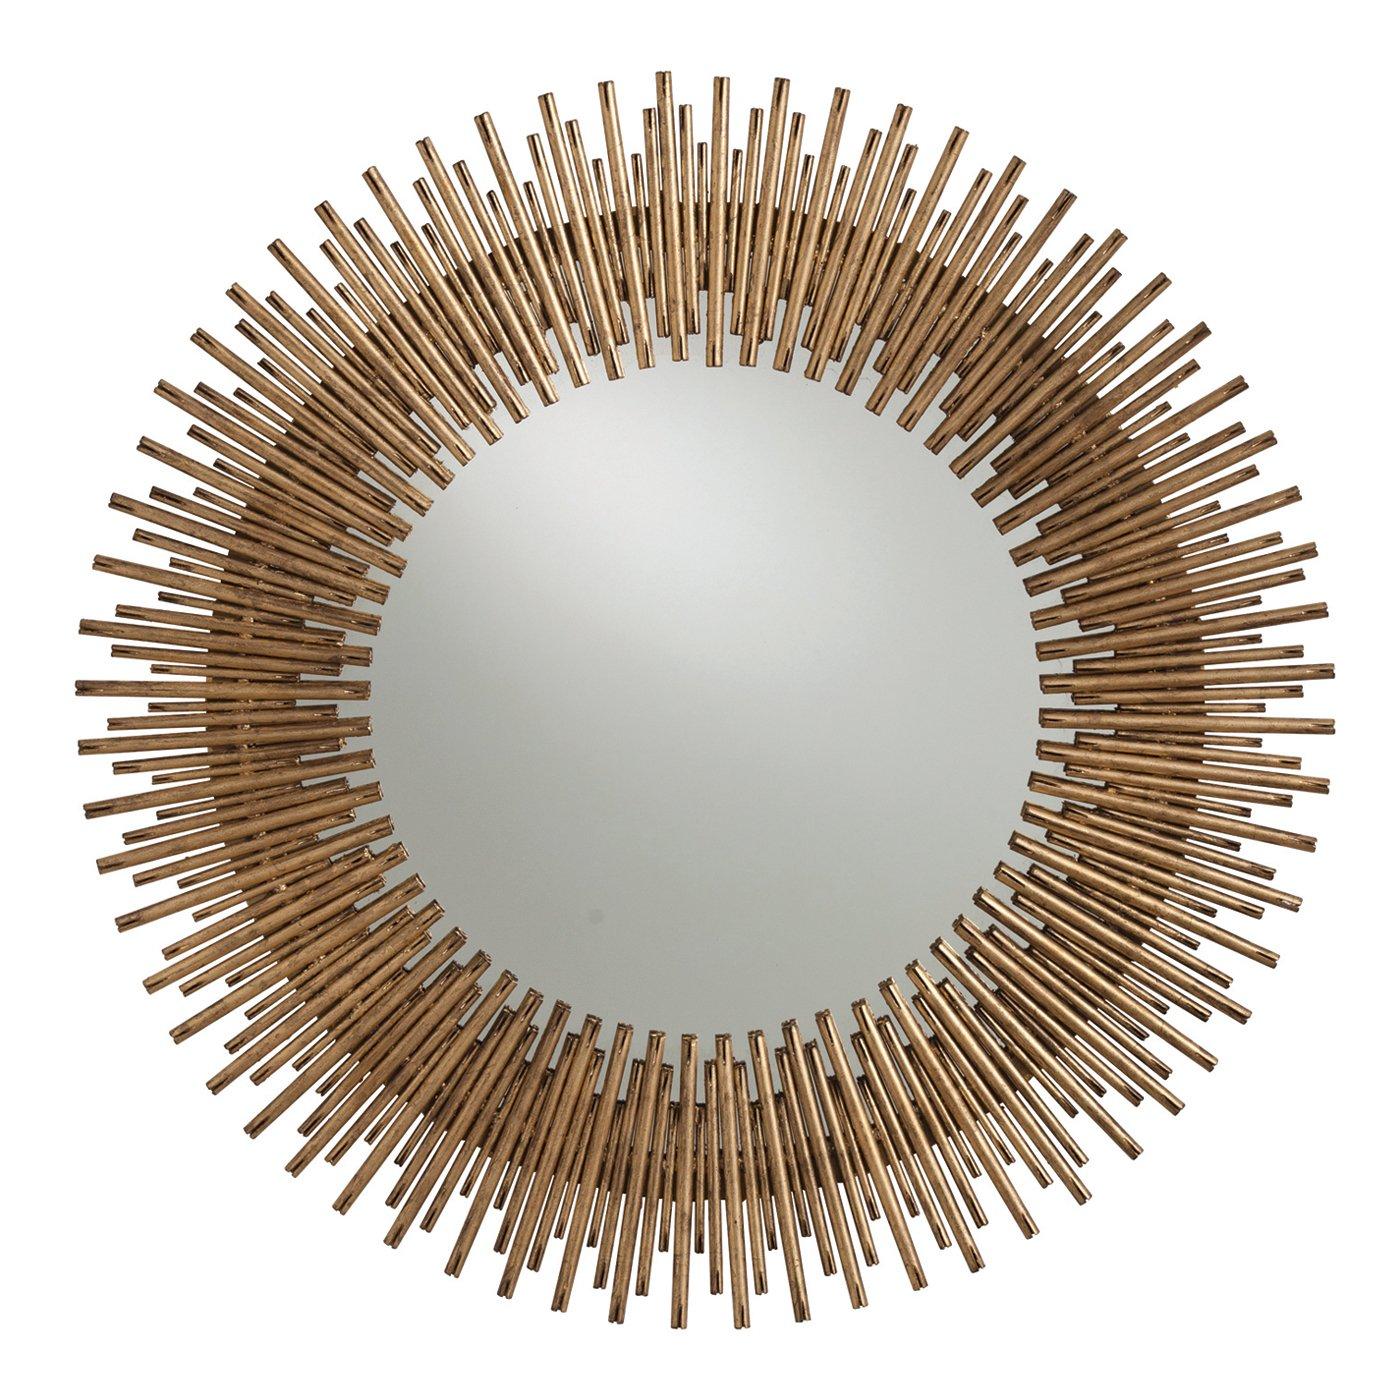 arteriors prescott round mirror  the mine— up to 70% off plus additional 15% off